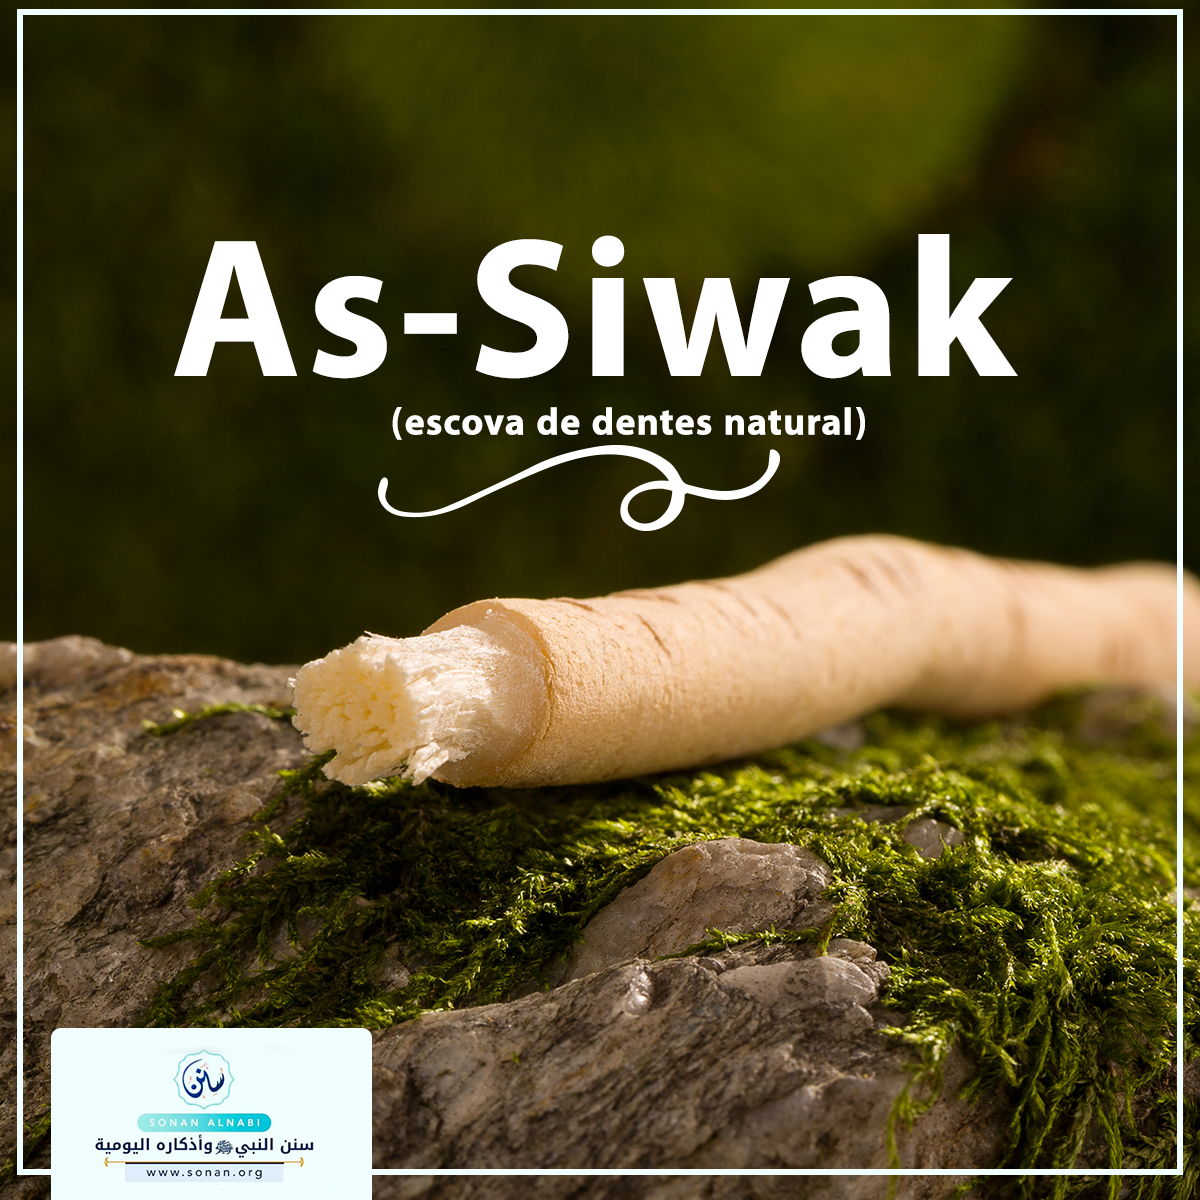 As-Siwak (escova de dentes natural).